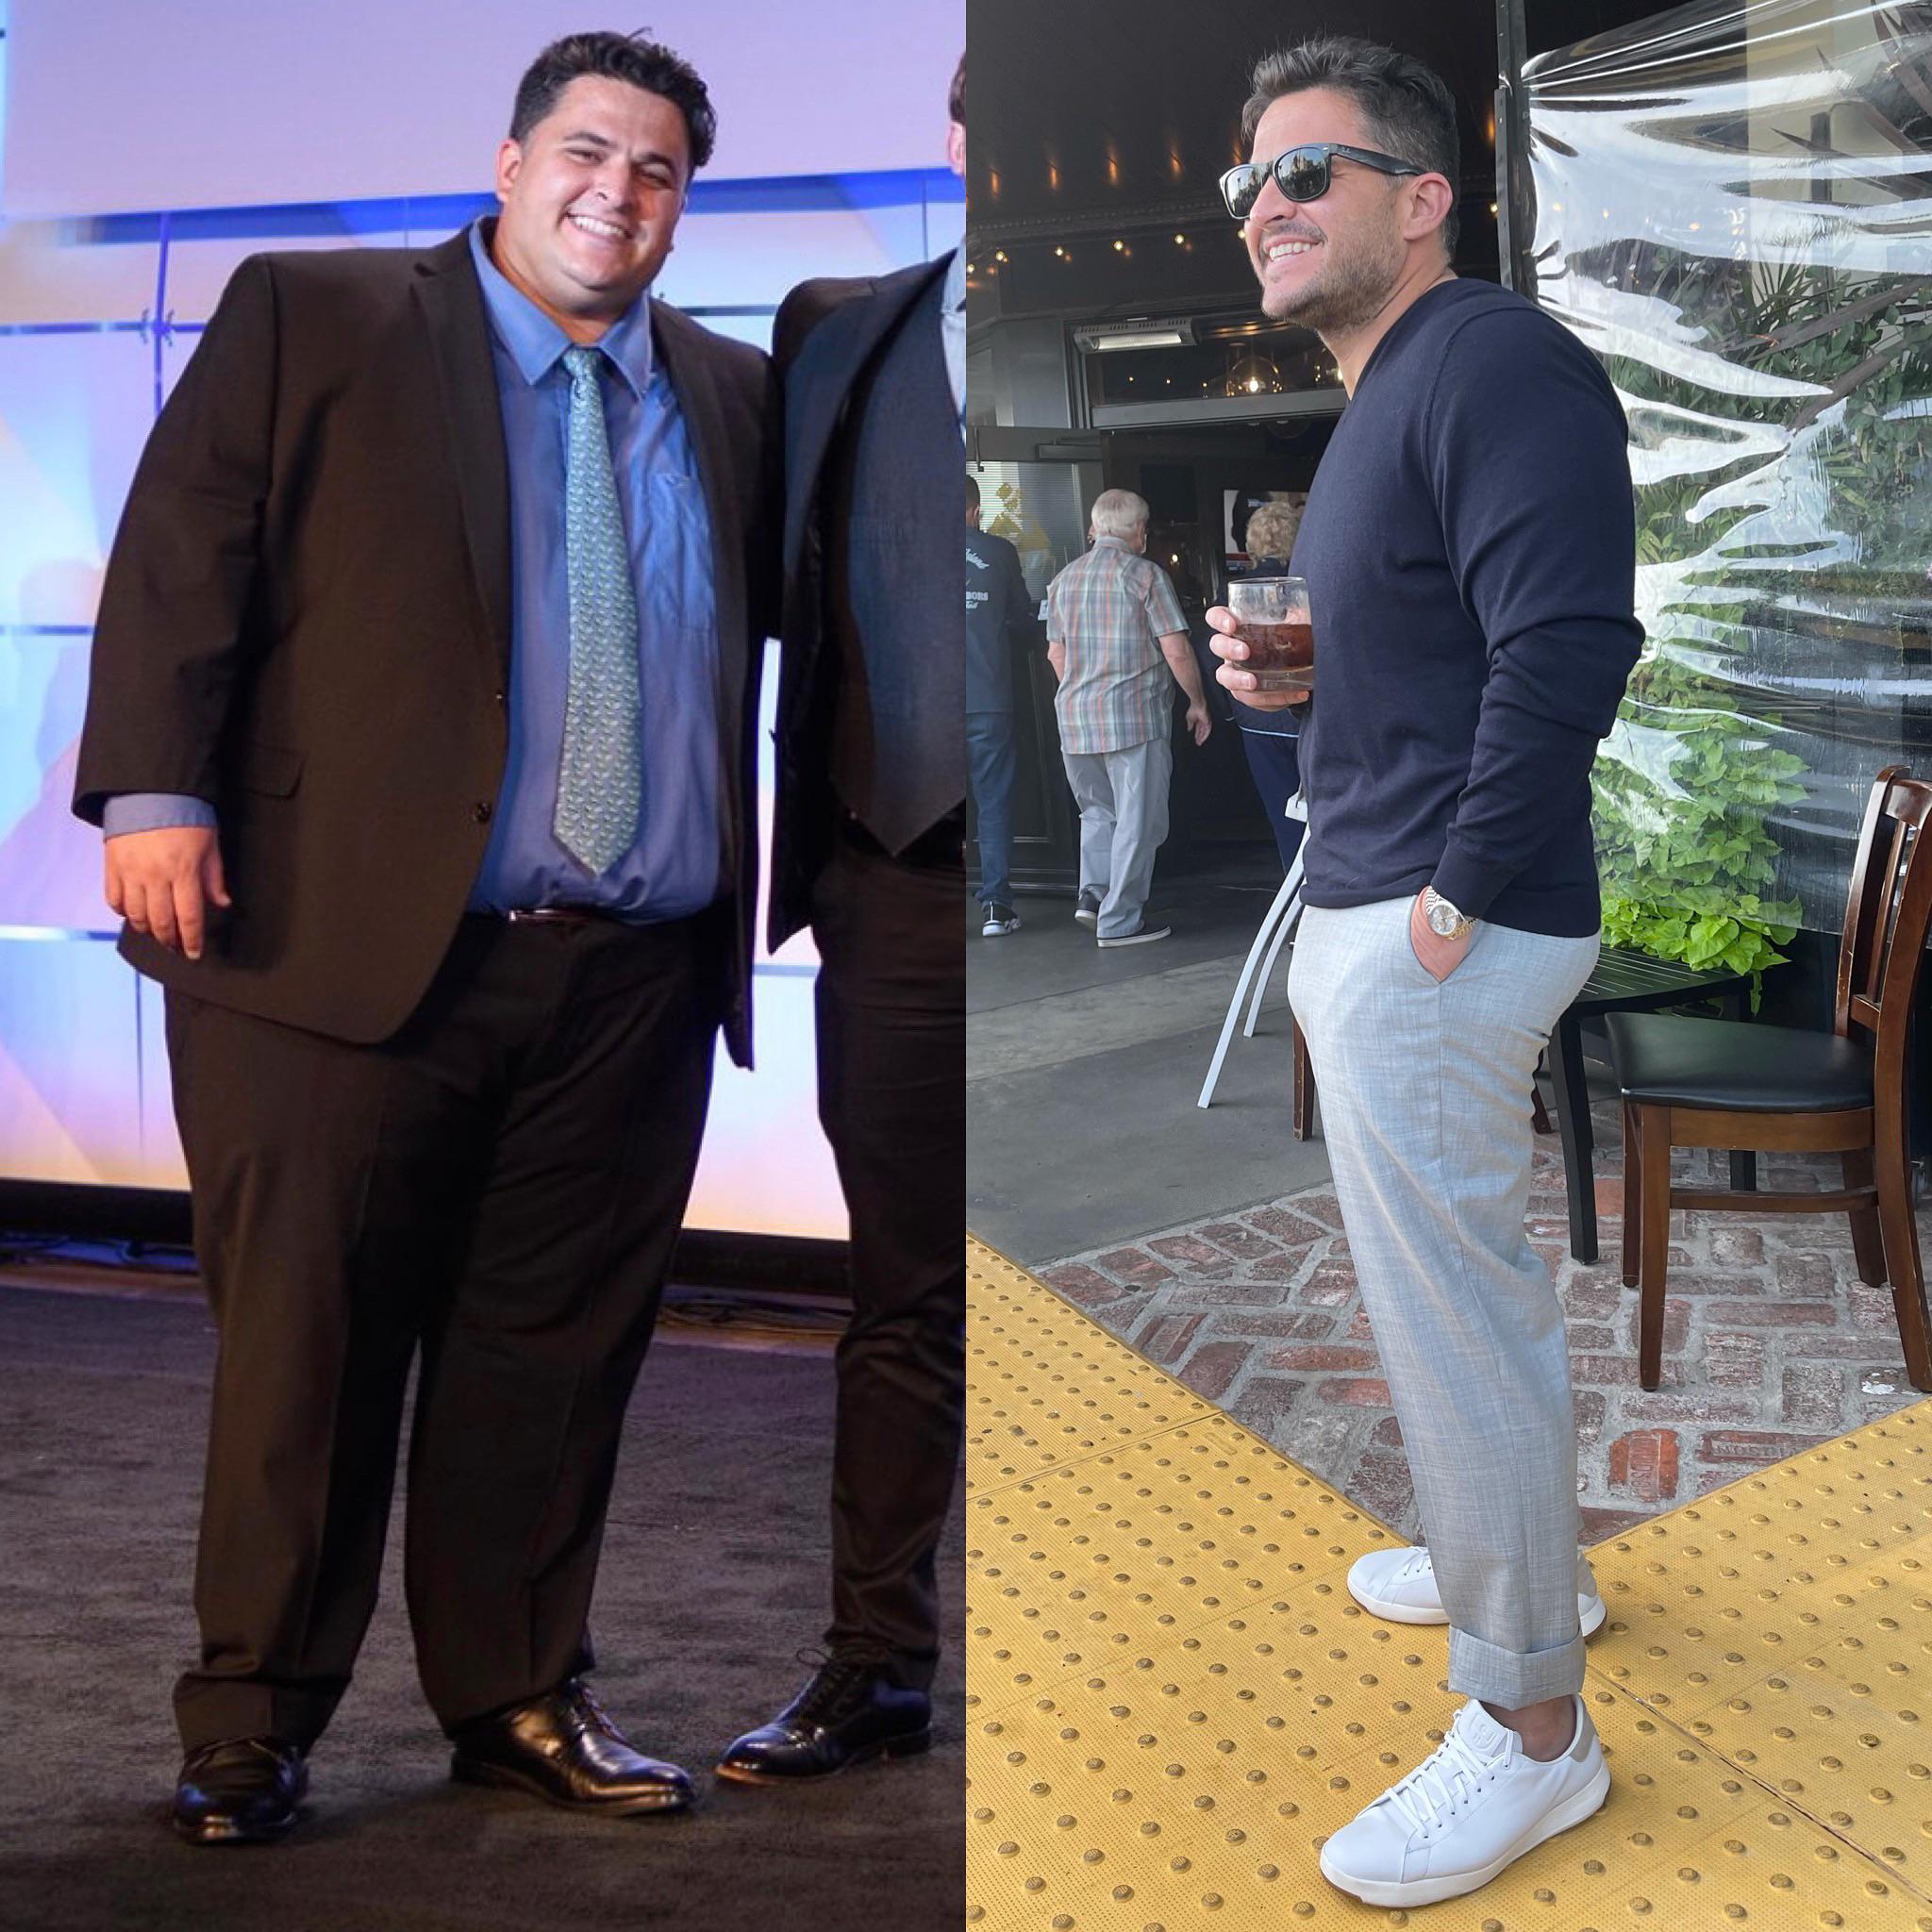 5'9 Male Progress Pics of 175 lbs Weight Loss 400 lbs to 225 lbs